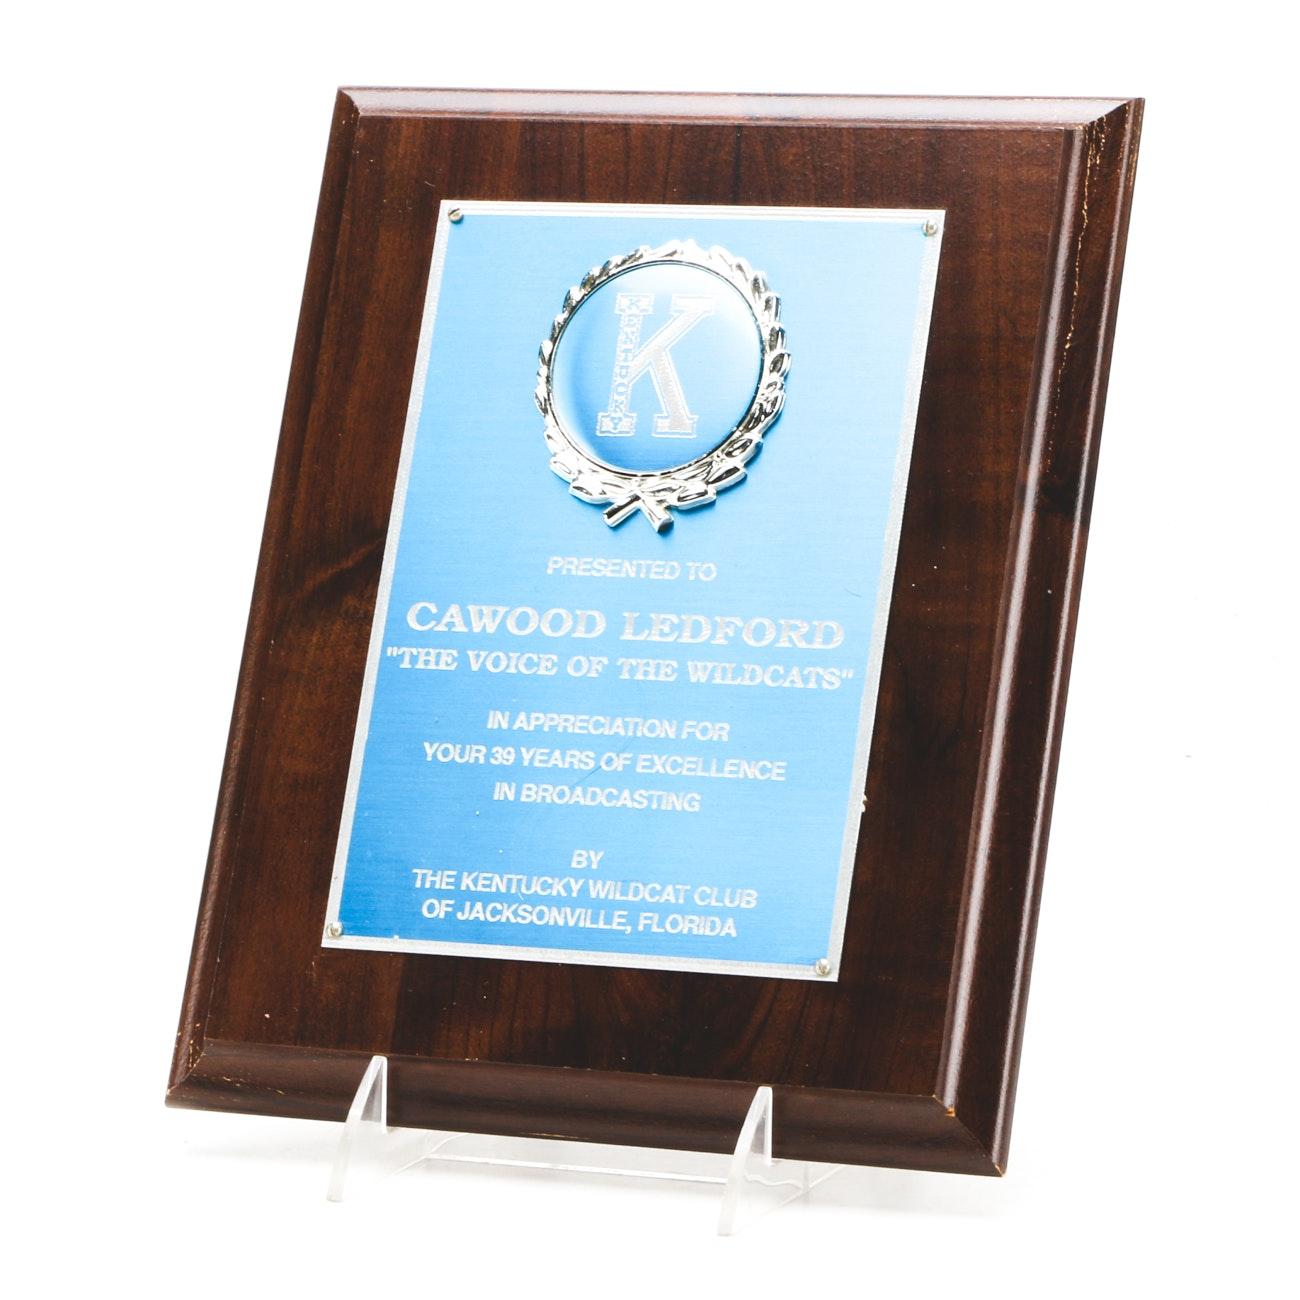 Cawood Ledford University of Kentucky Presentation Plaque Trophy